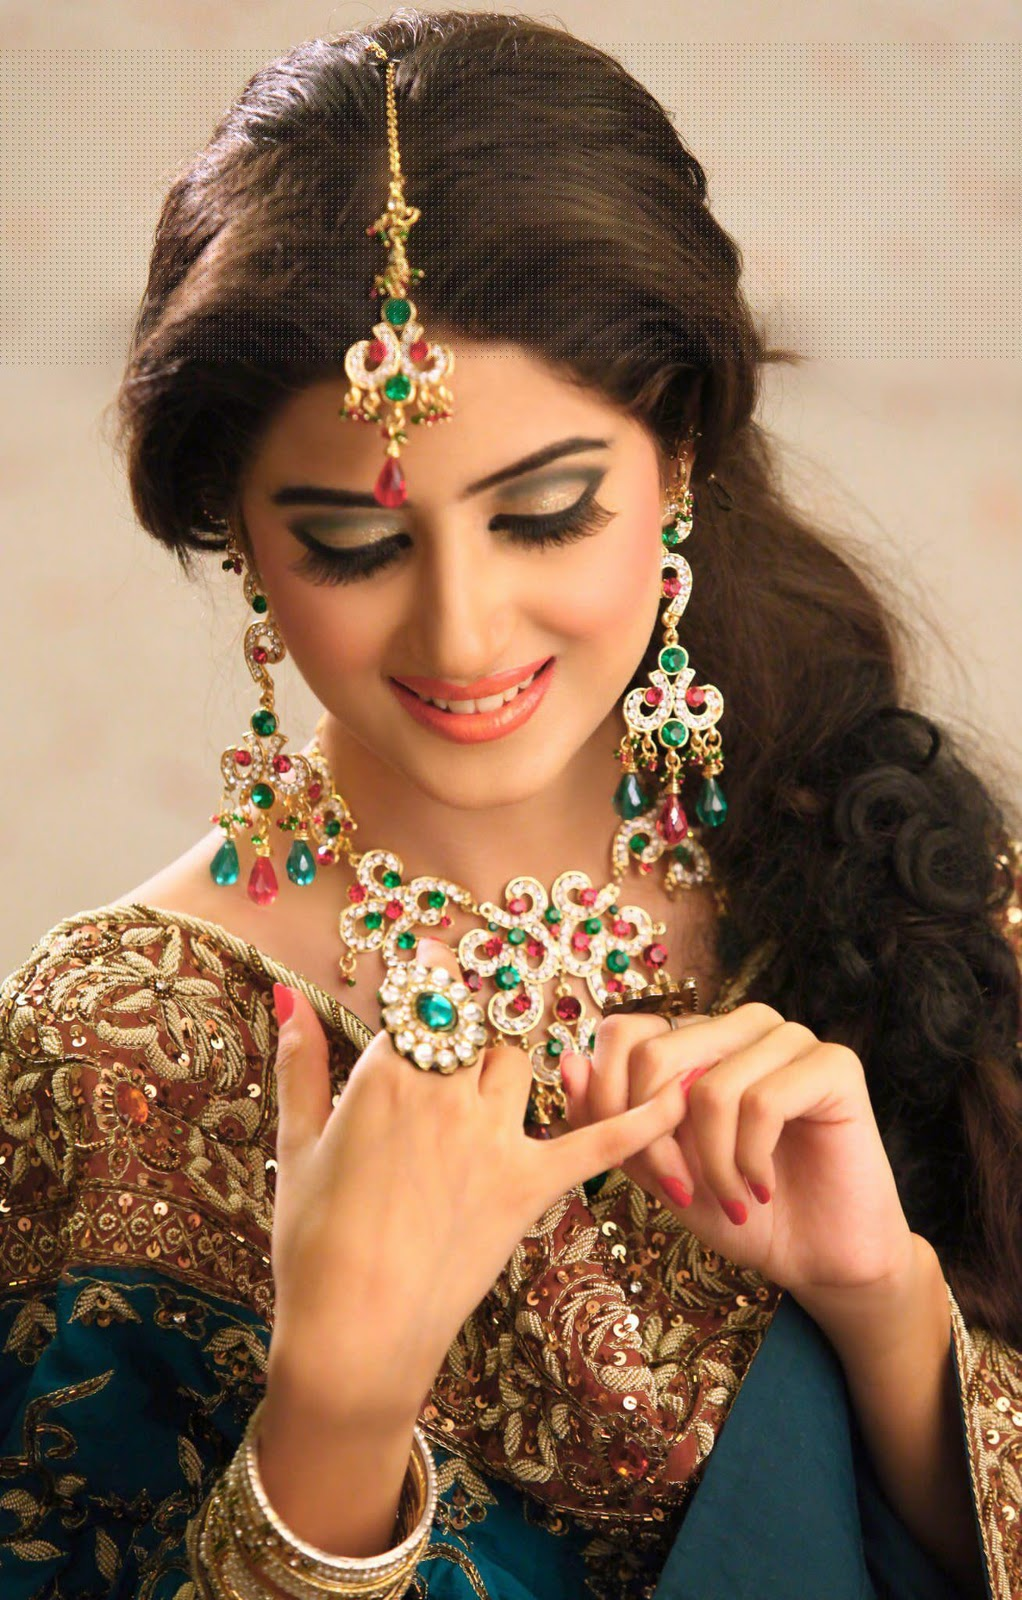 Bridal Makeup Ki Photo : Entertainment News: Cute Pakistani Bridal Makeup and ...